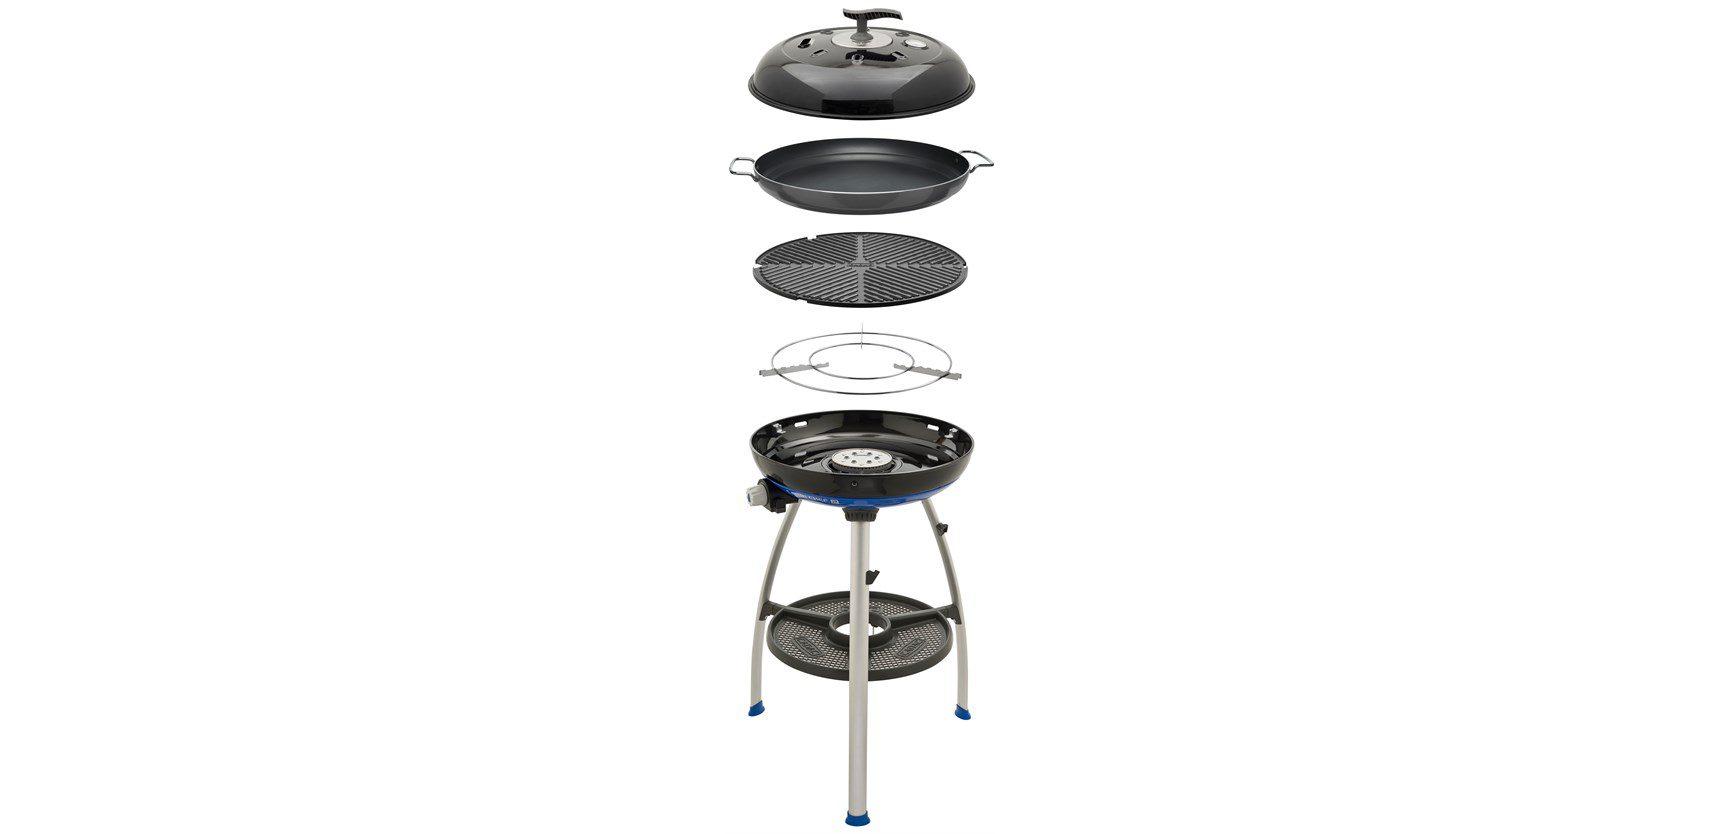 Cadac Carri Chef Paella Pan Combo